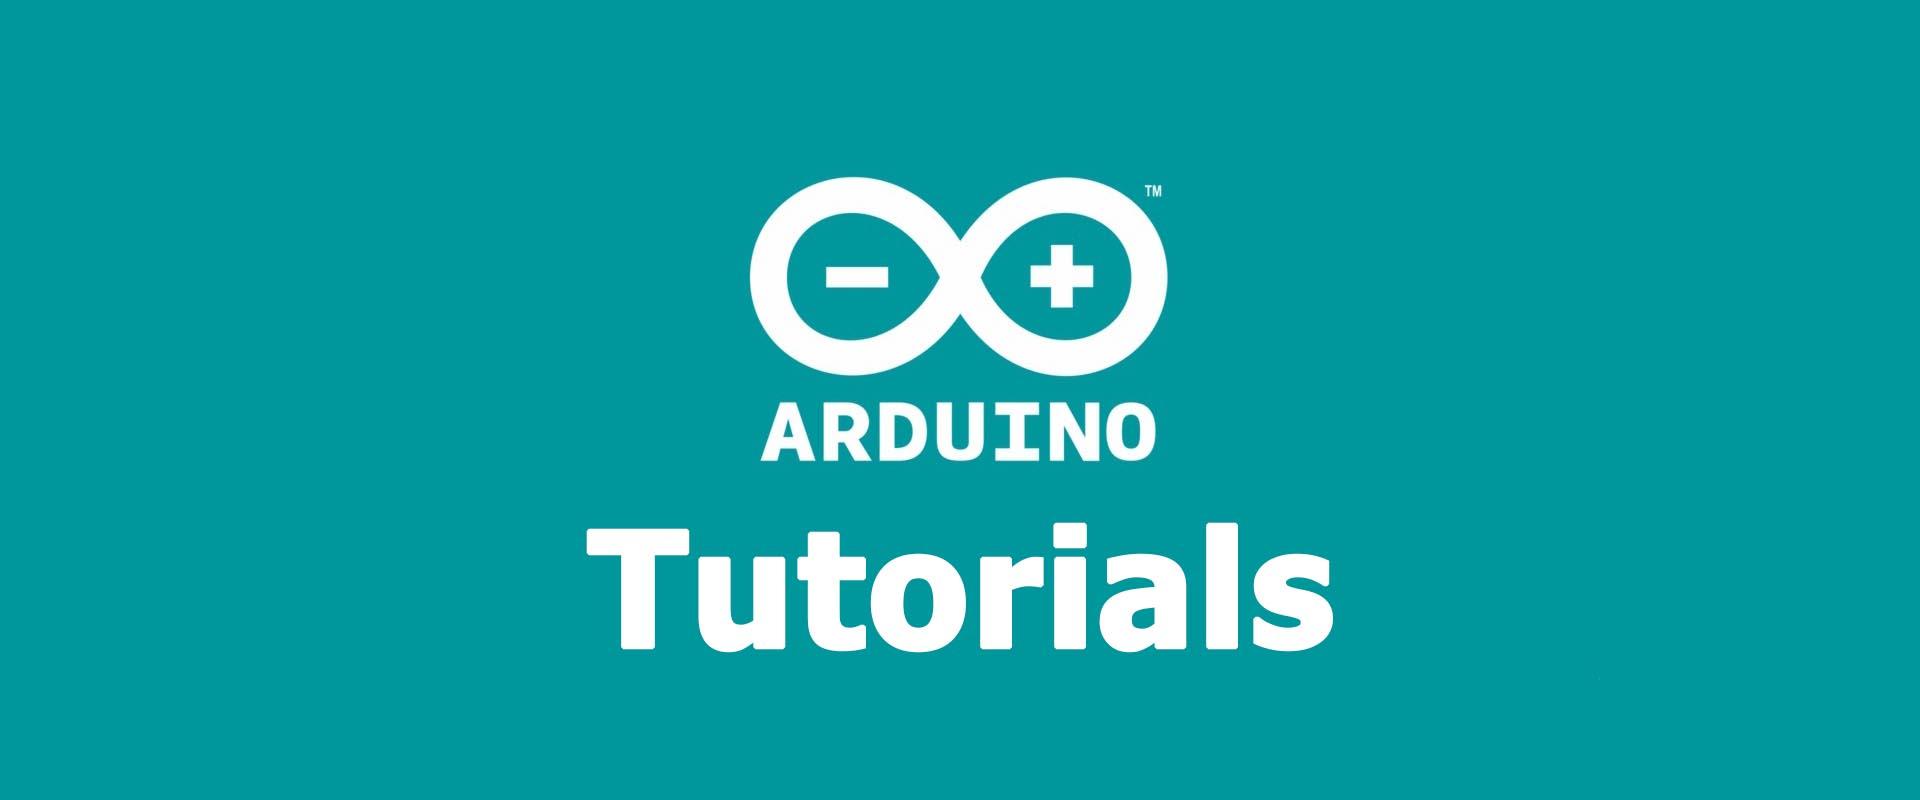 Aduino Tutorial آموزش آردوینو